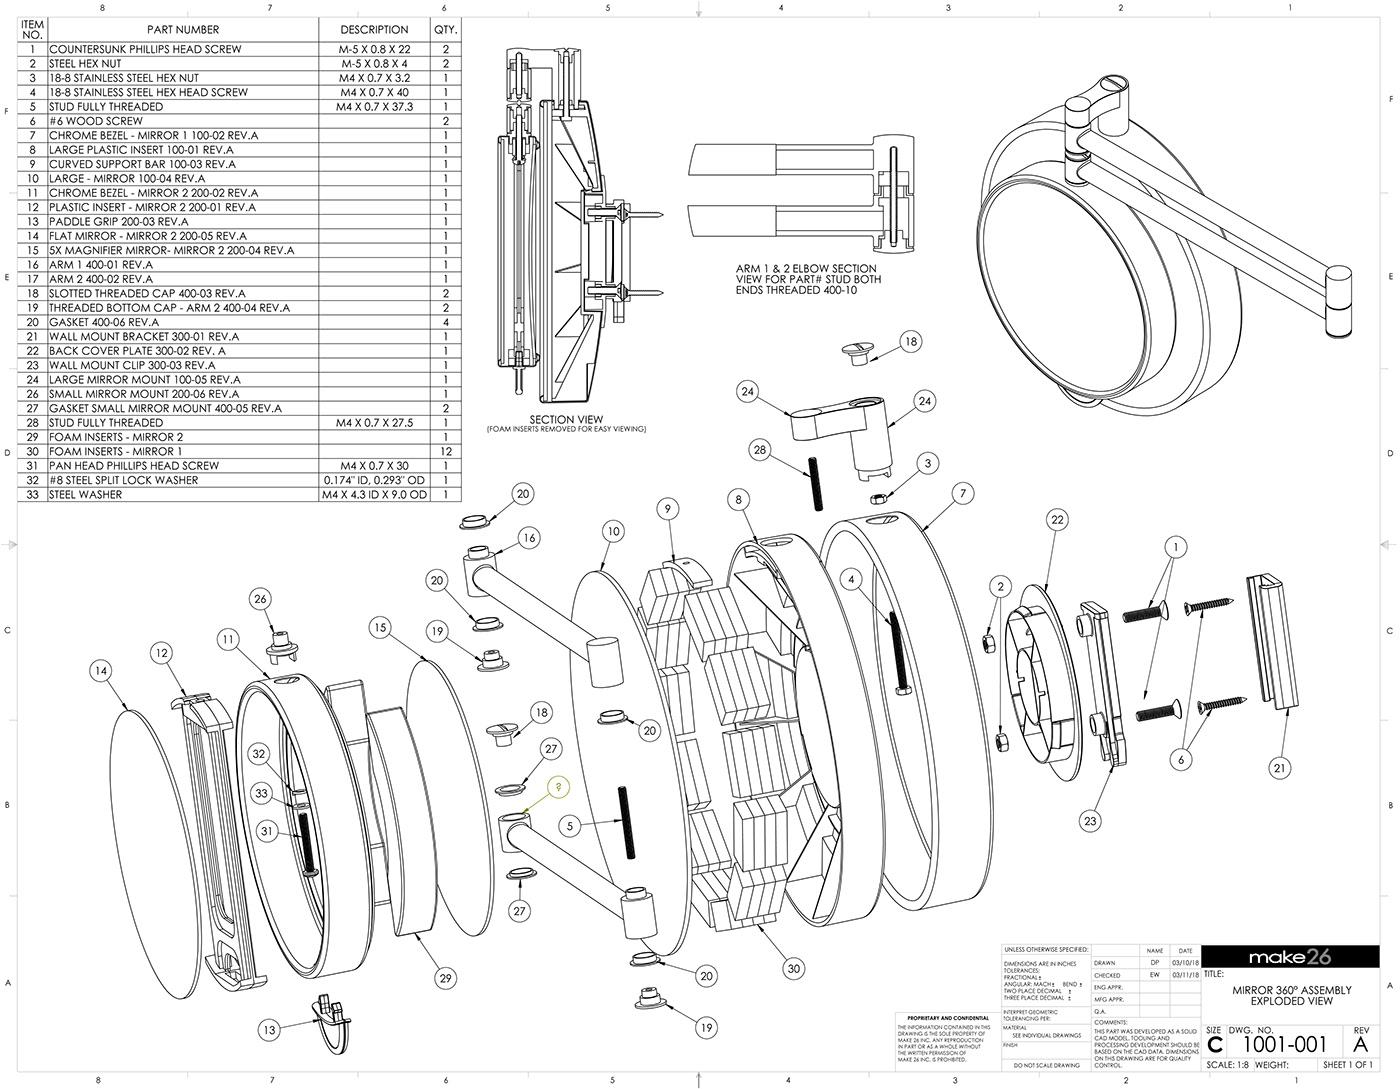 Blueprints in SolidWorks on Behance